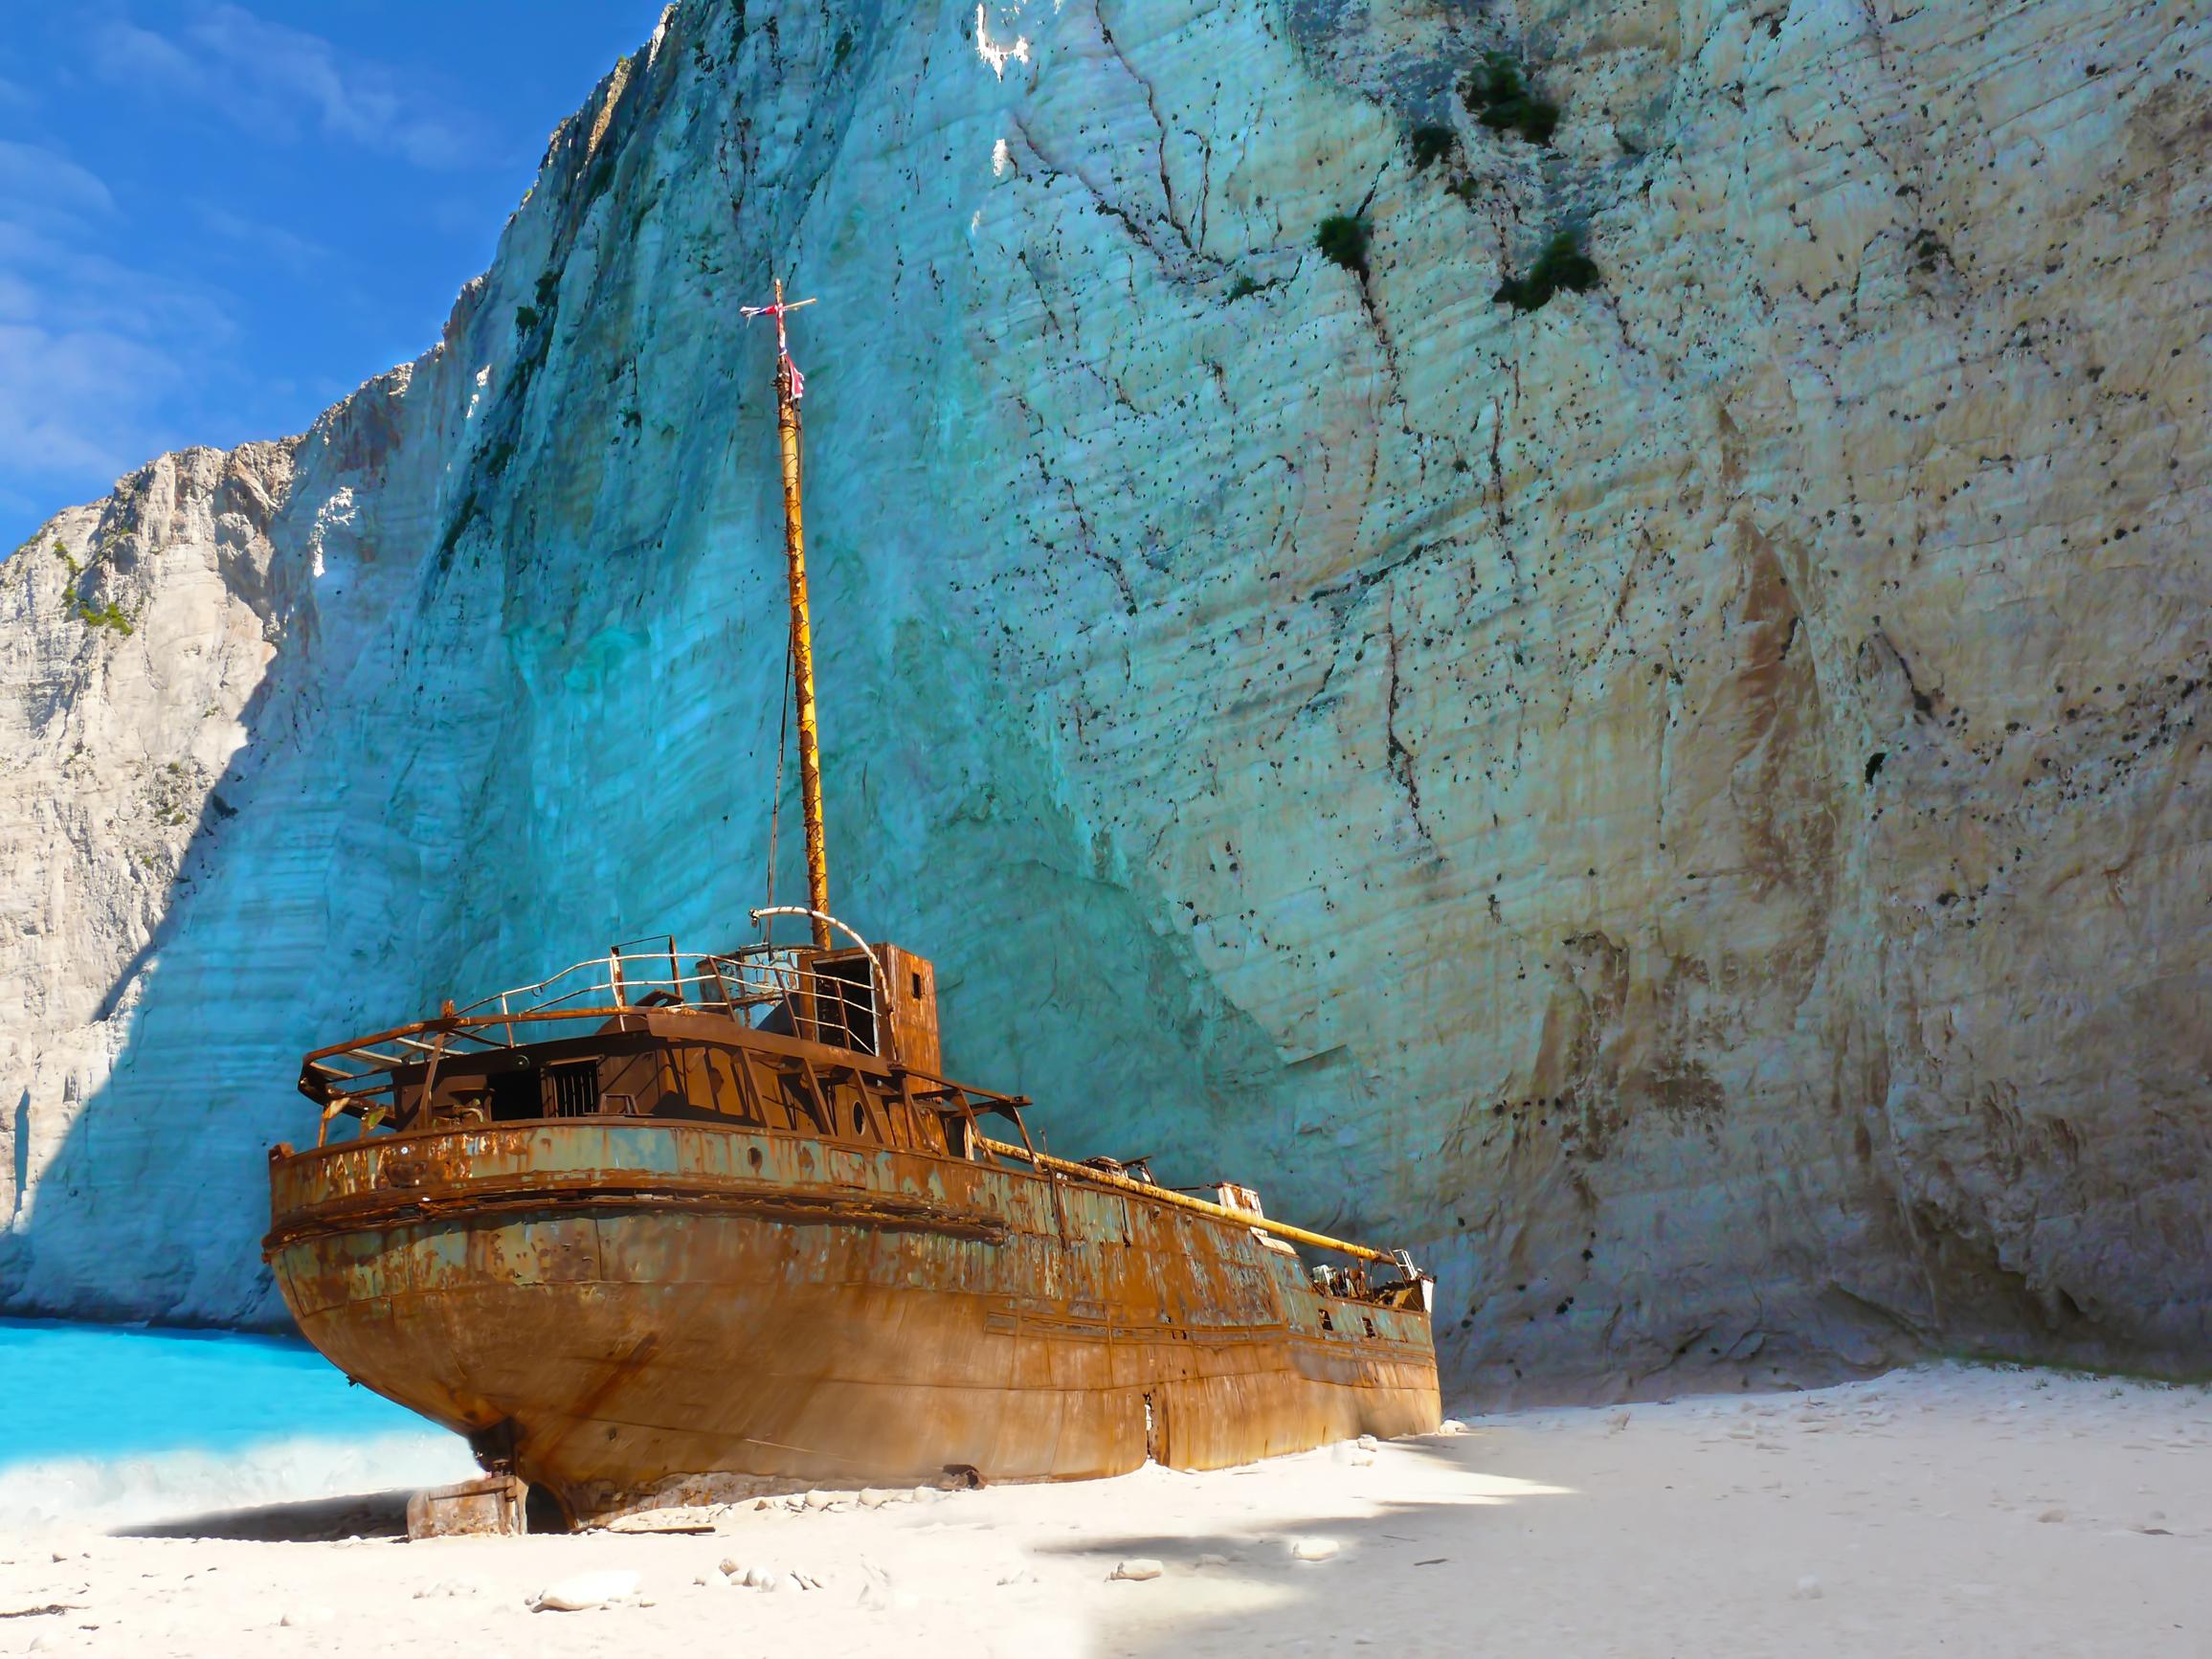 Island With Abandoned Ship On Beach